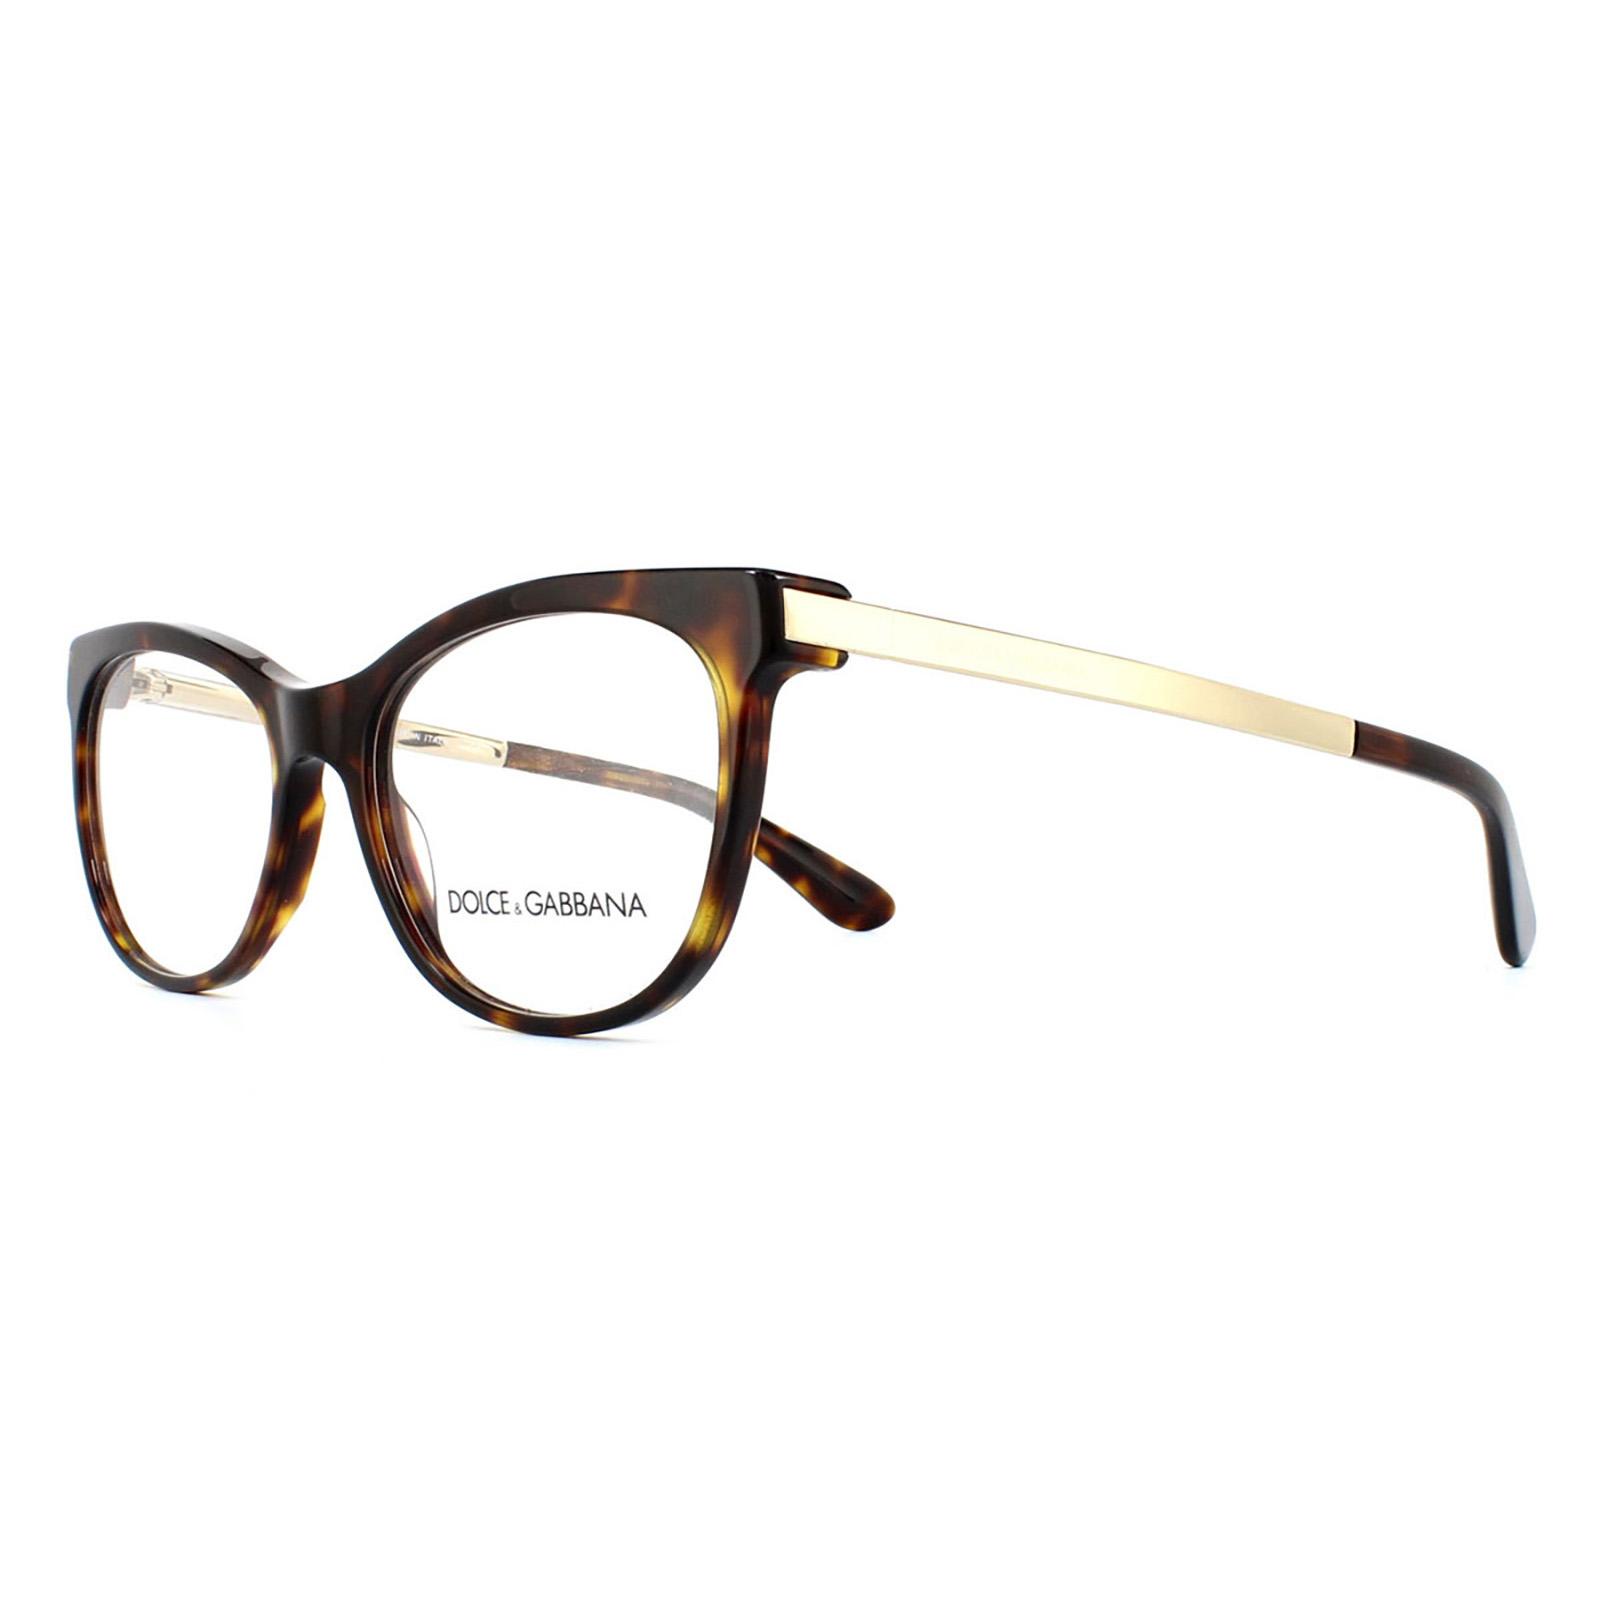 88b65937e43 Sentinel Dolce and Gabbana Glasses Frames 3234 502 Dark Havana Womens 54mm